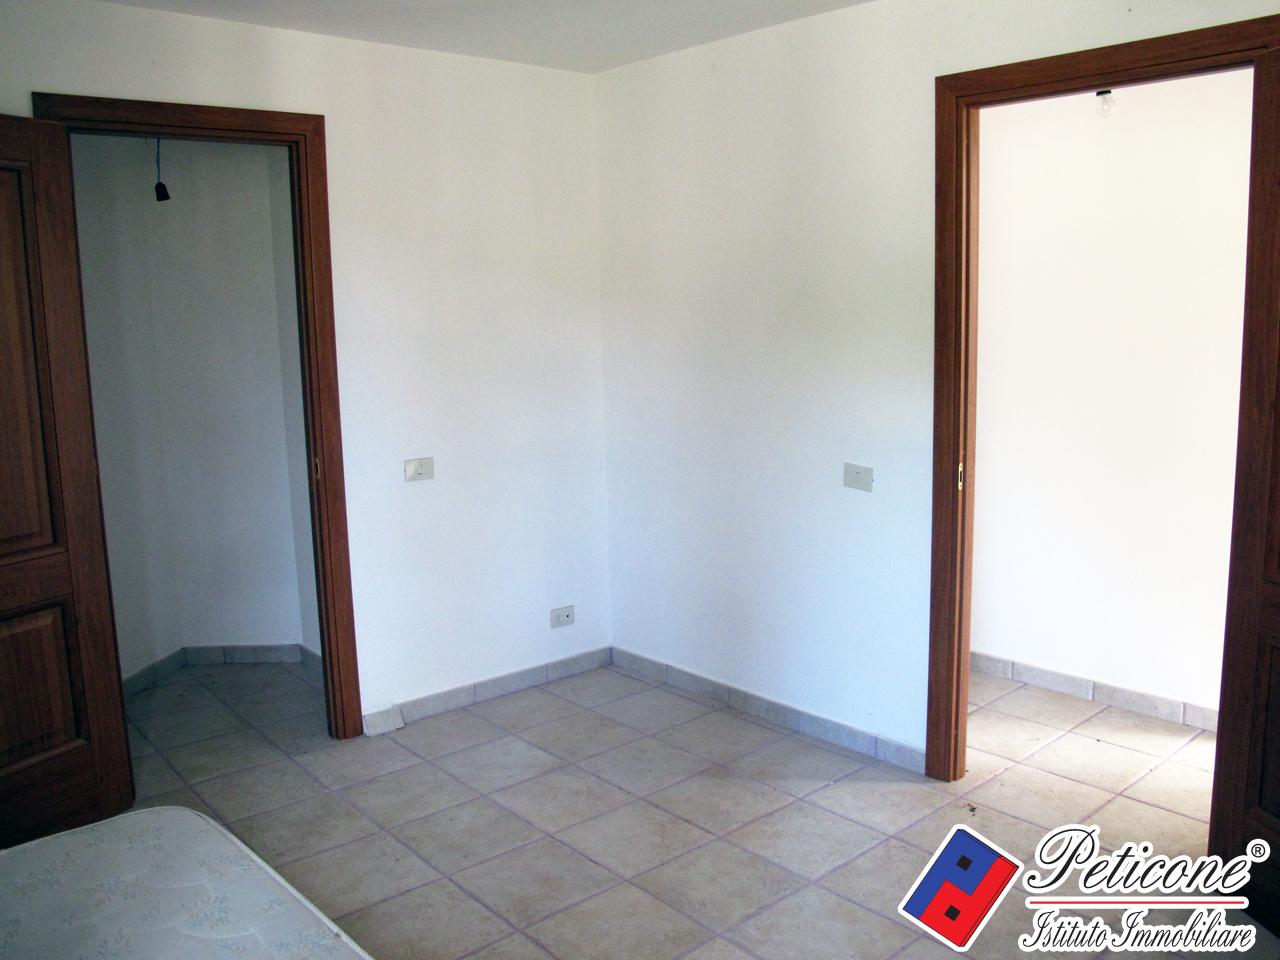 Appartamento in Vendita a Sperlonga: 1 locali, 45 mq - Foto 6